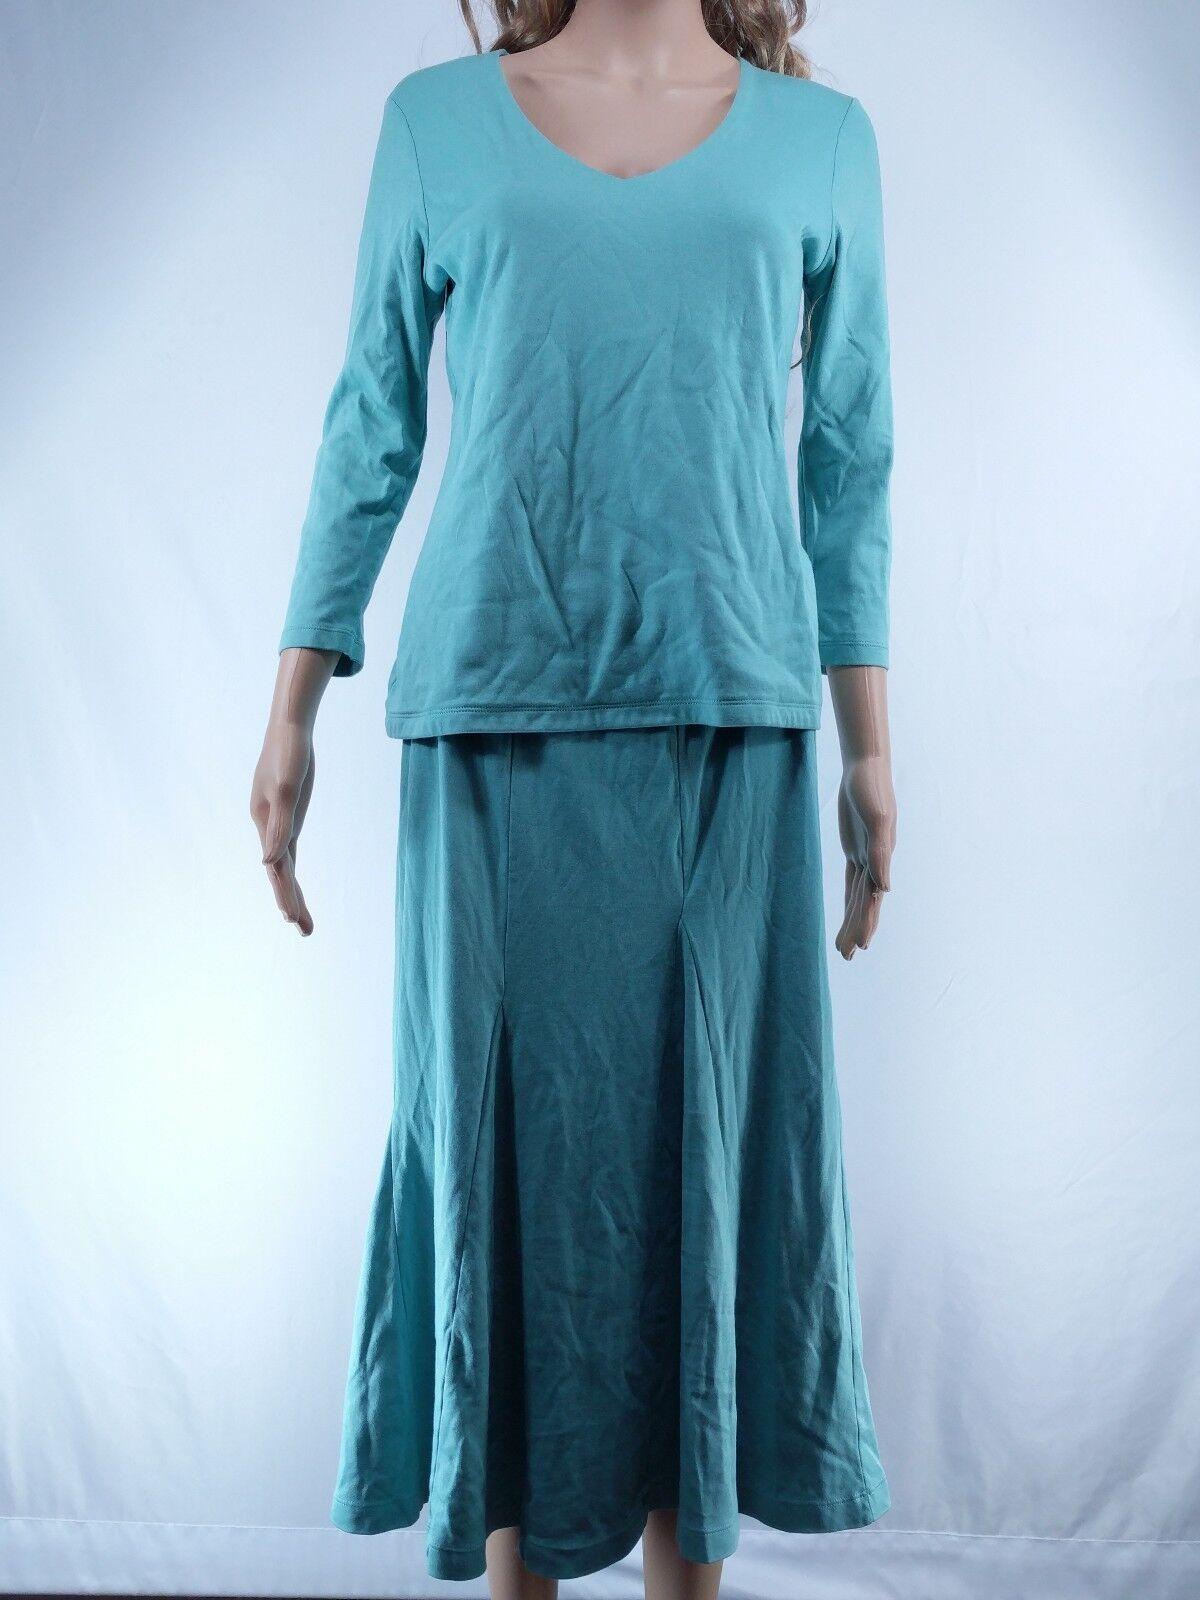 Peruvian Connection Medium Long Sleeve Top & Pull On Skirt Set bluee Pima Cotton